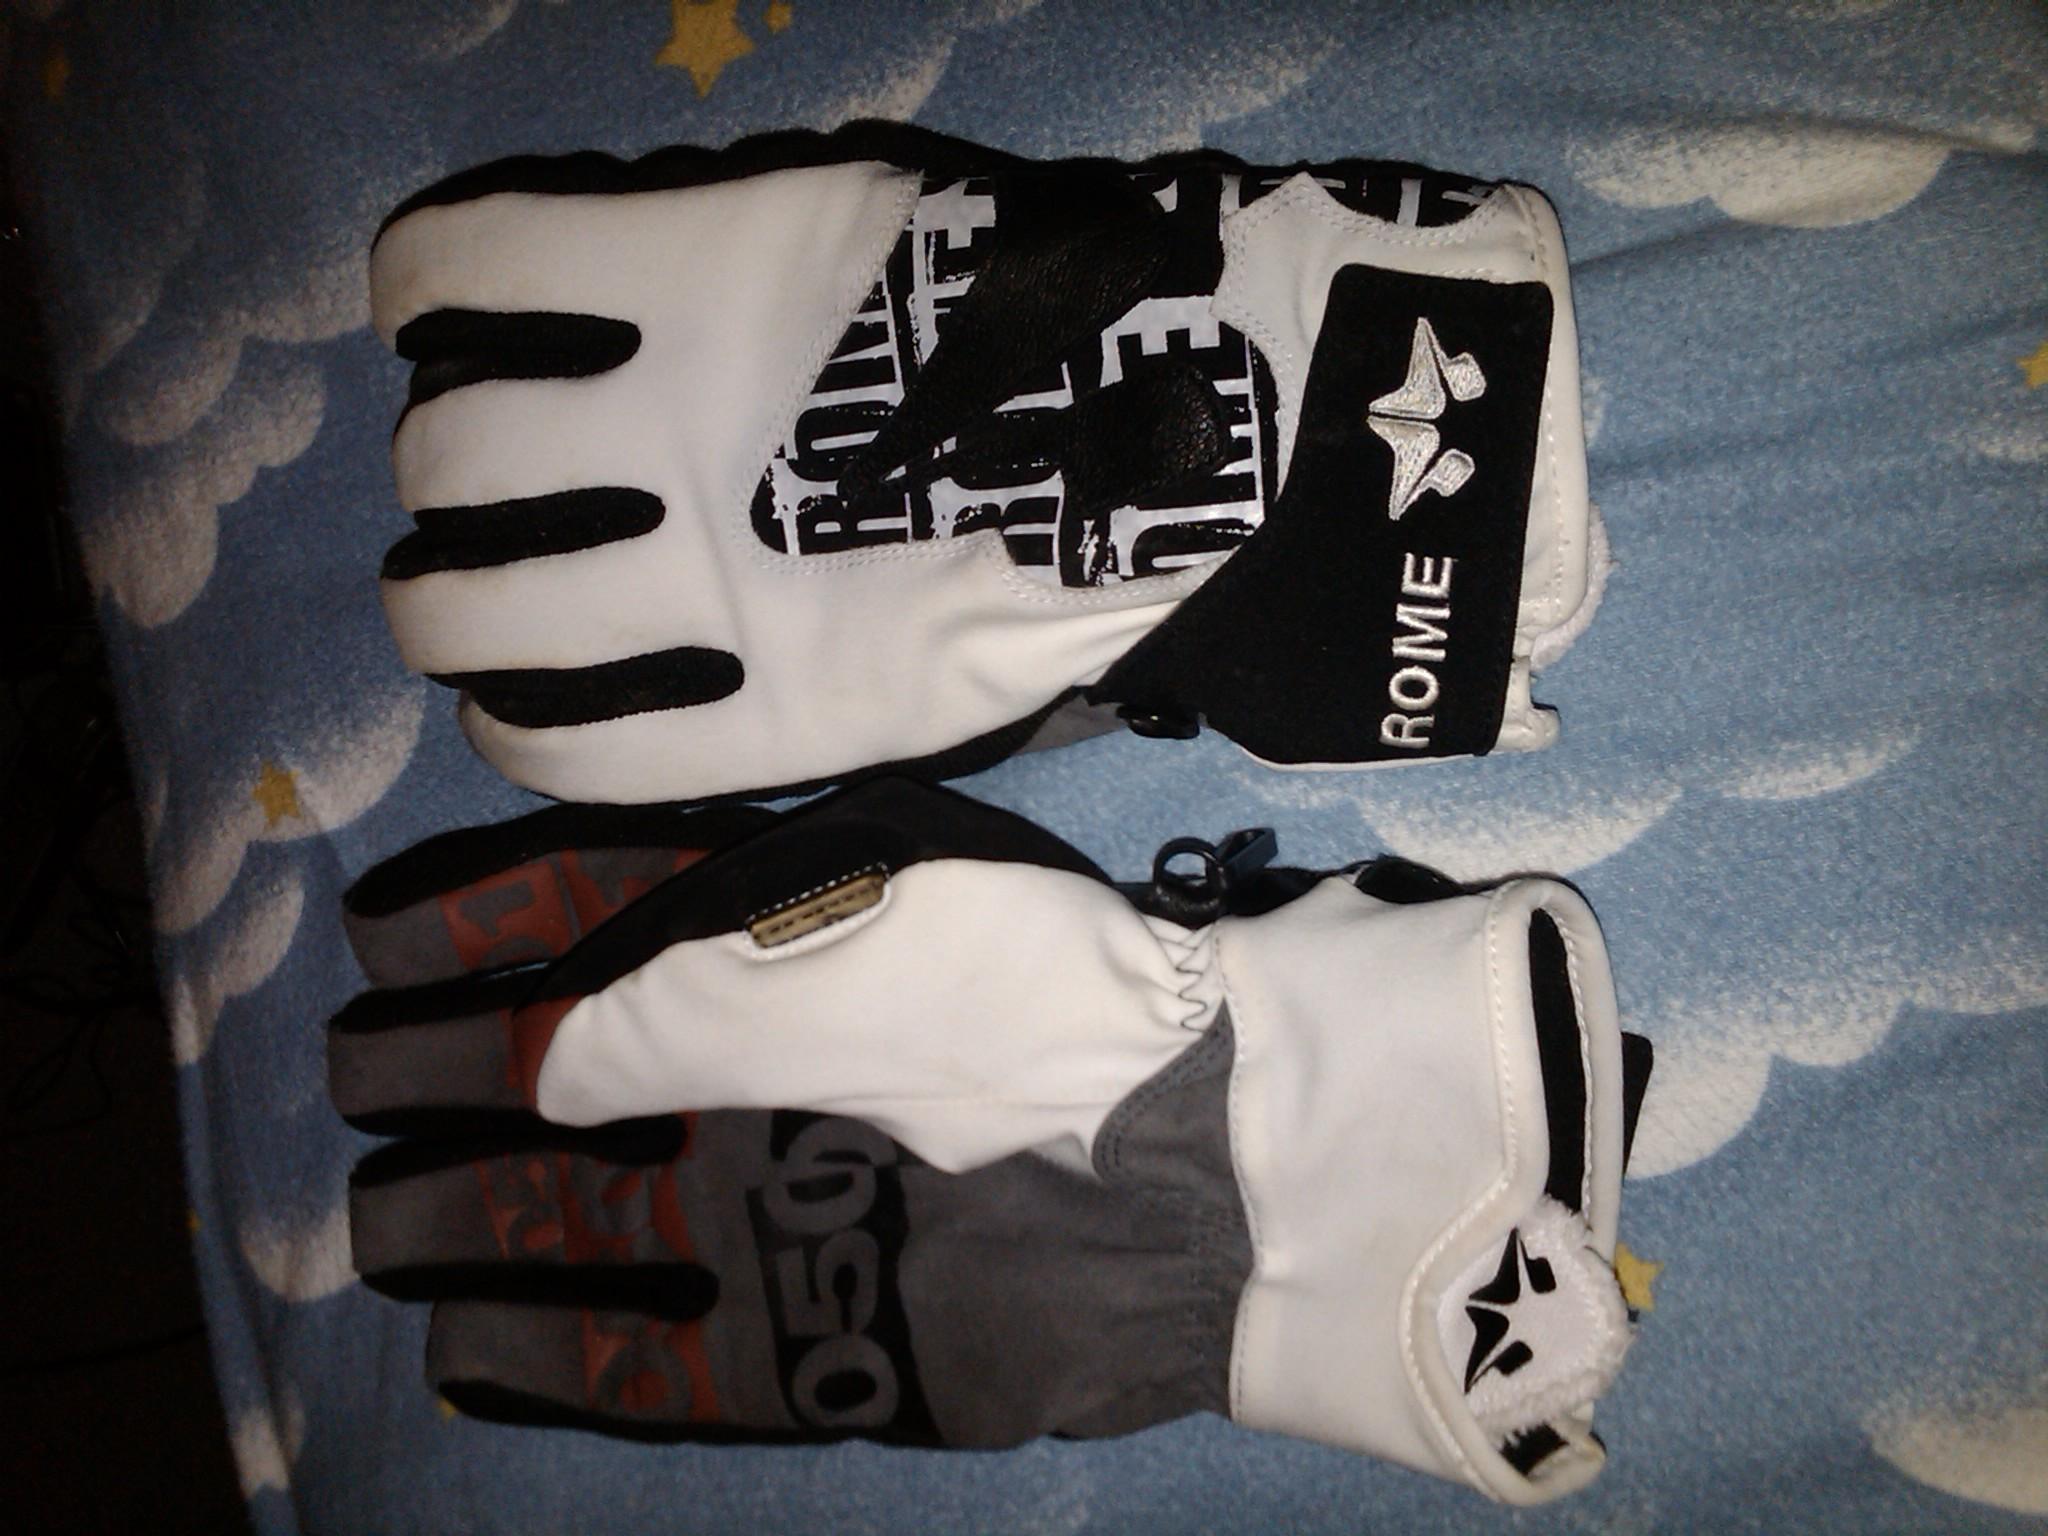 Rome park glove